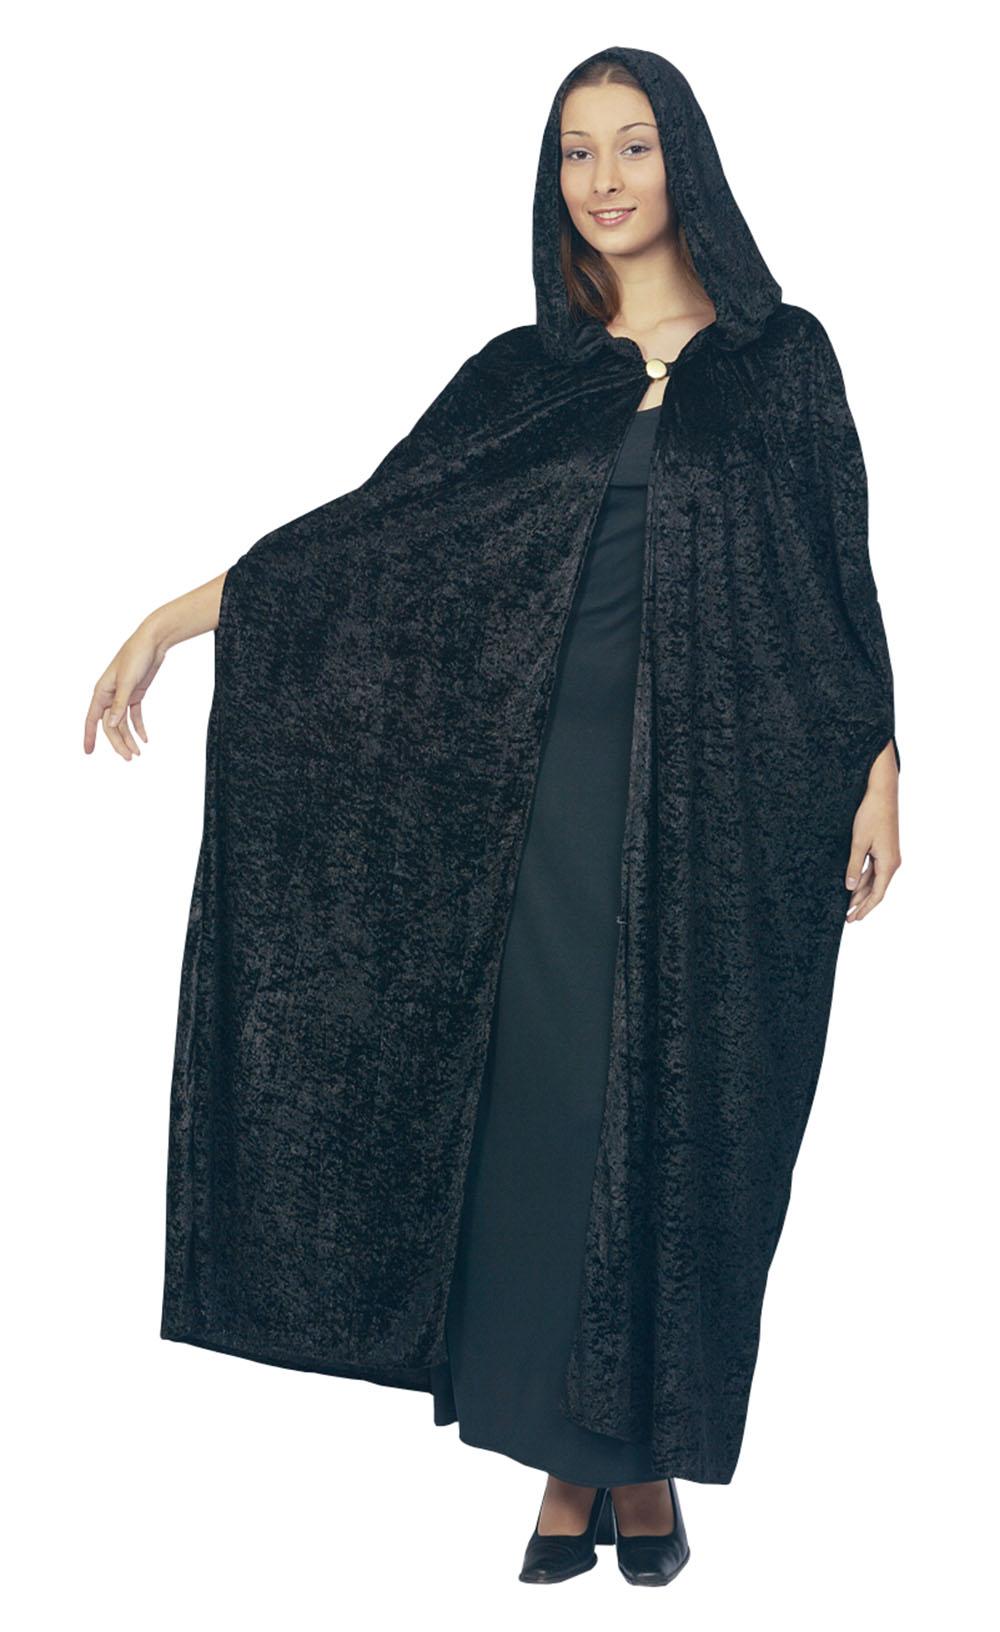 Ladies Hooded Black Velvet Cloak Fancy Dress Costume Gothic Halloween UK 10-14